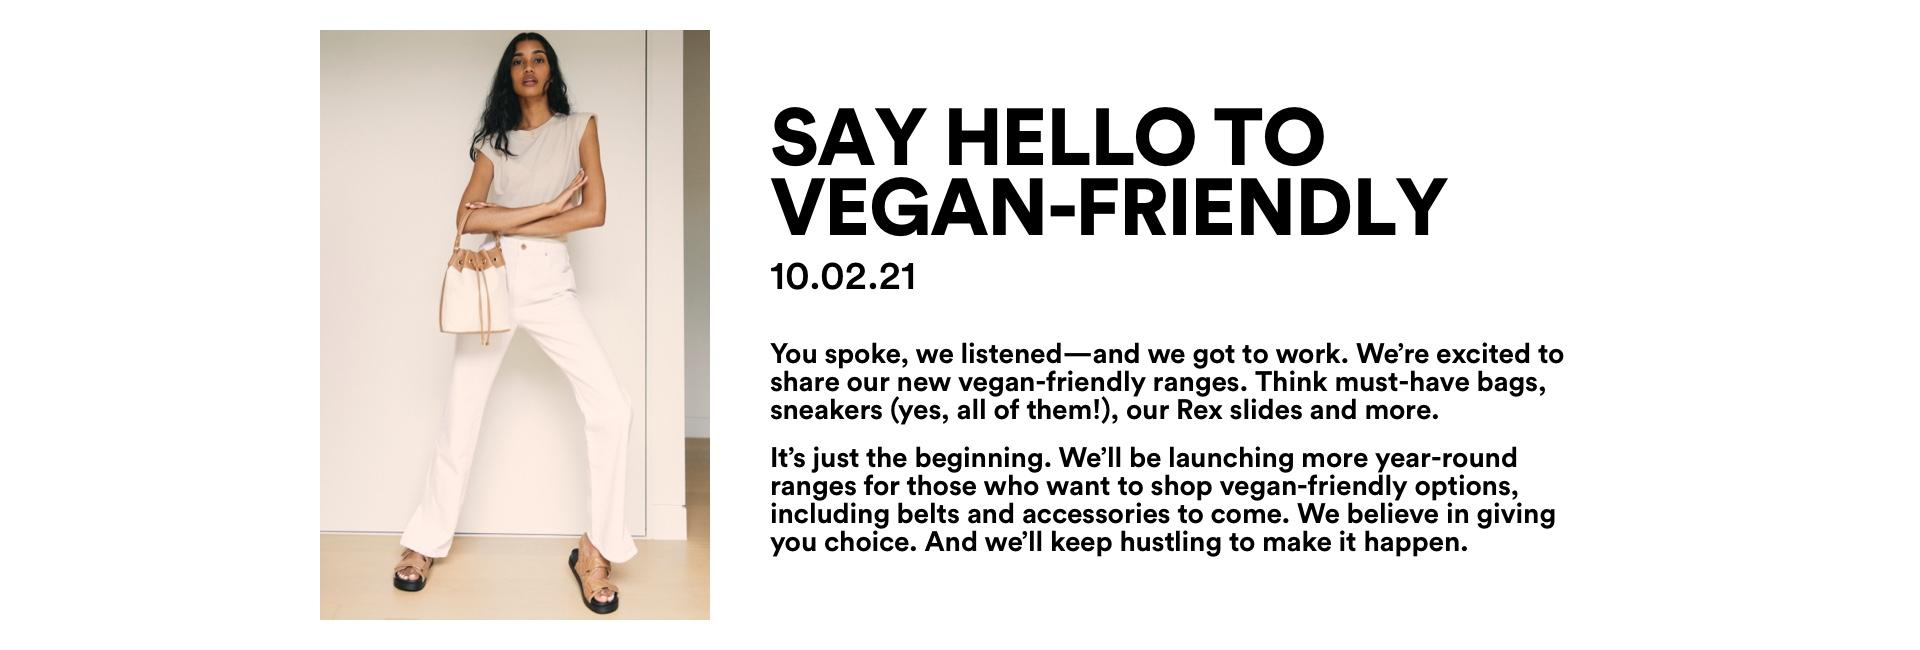 Say hello to vegan-friendly.